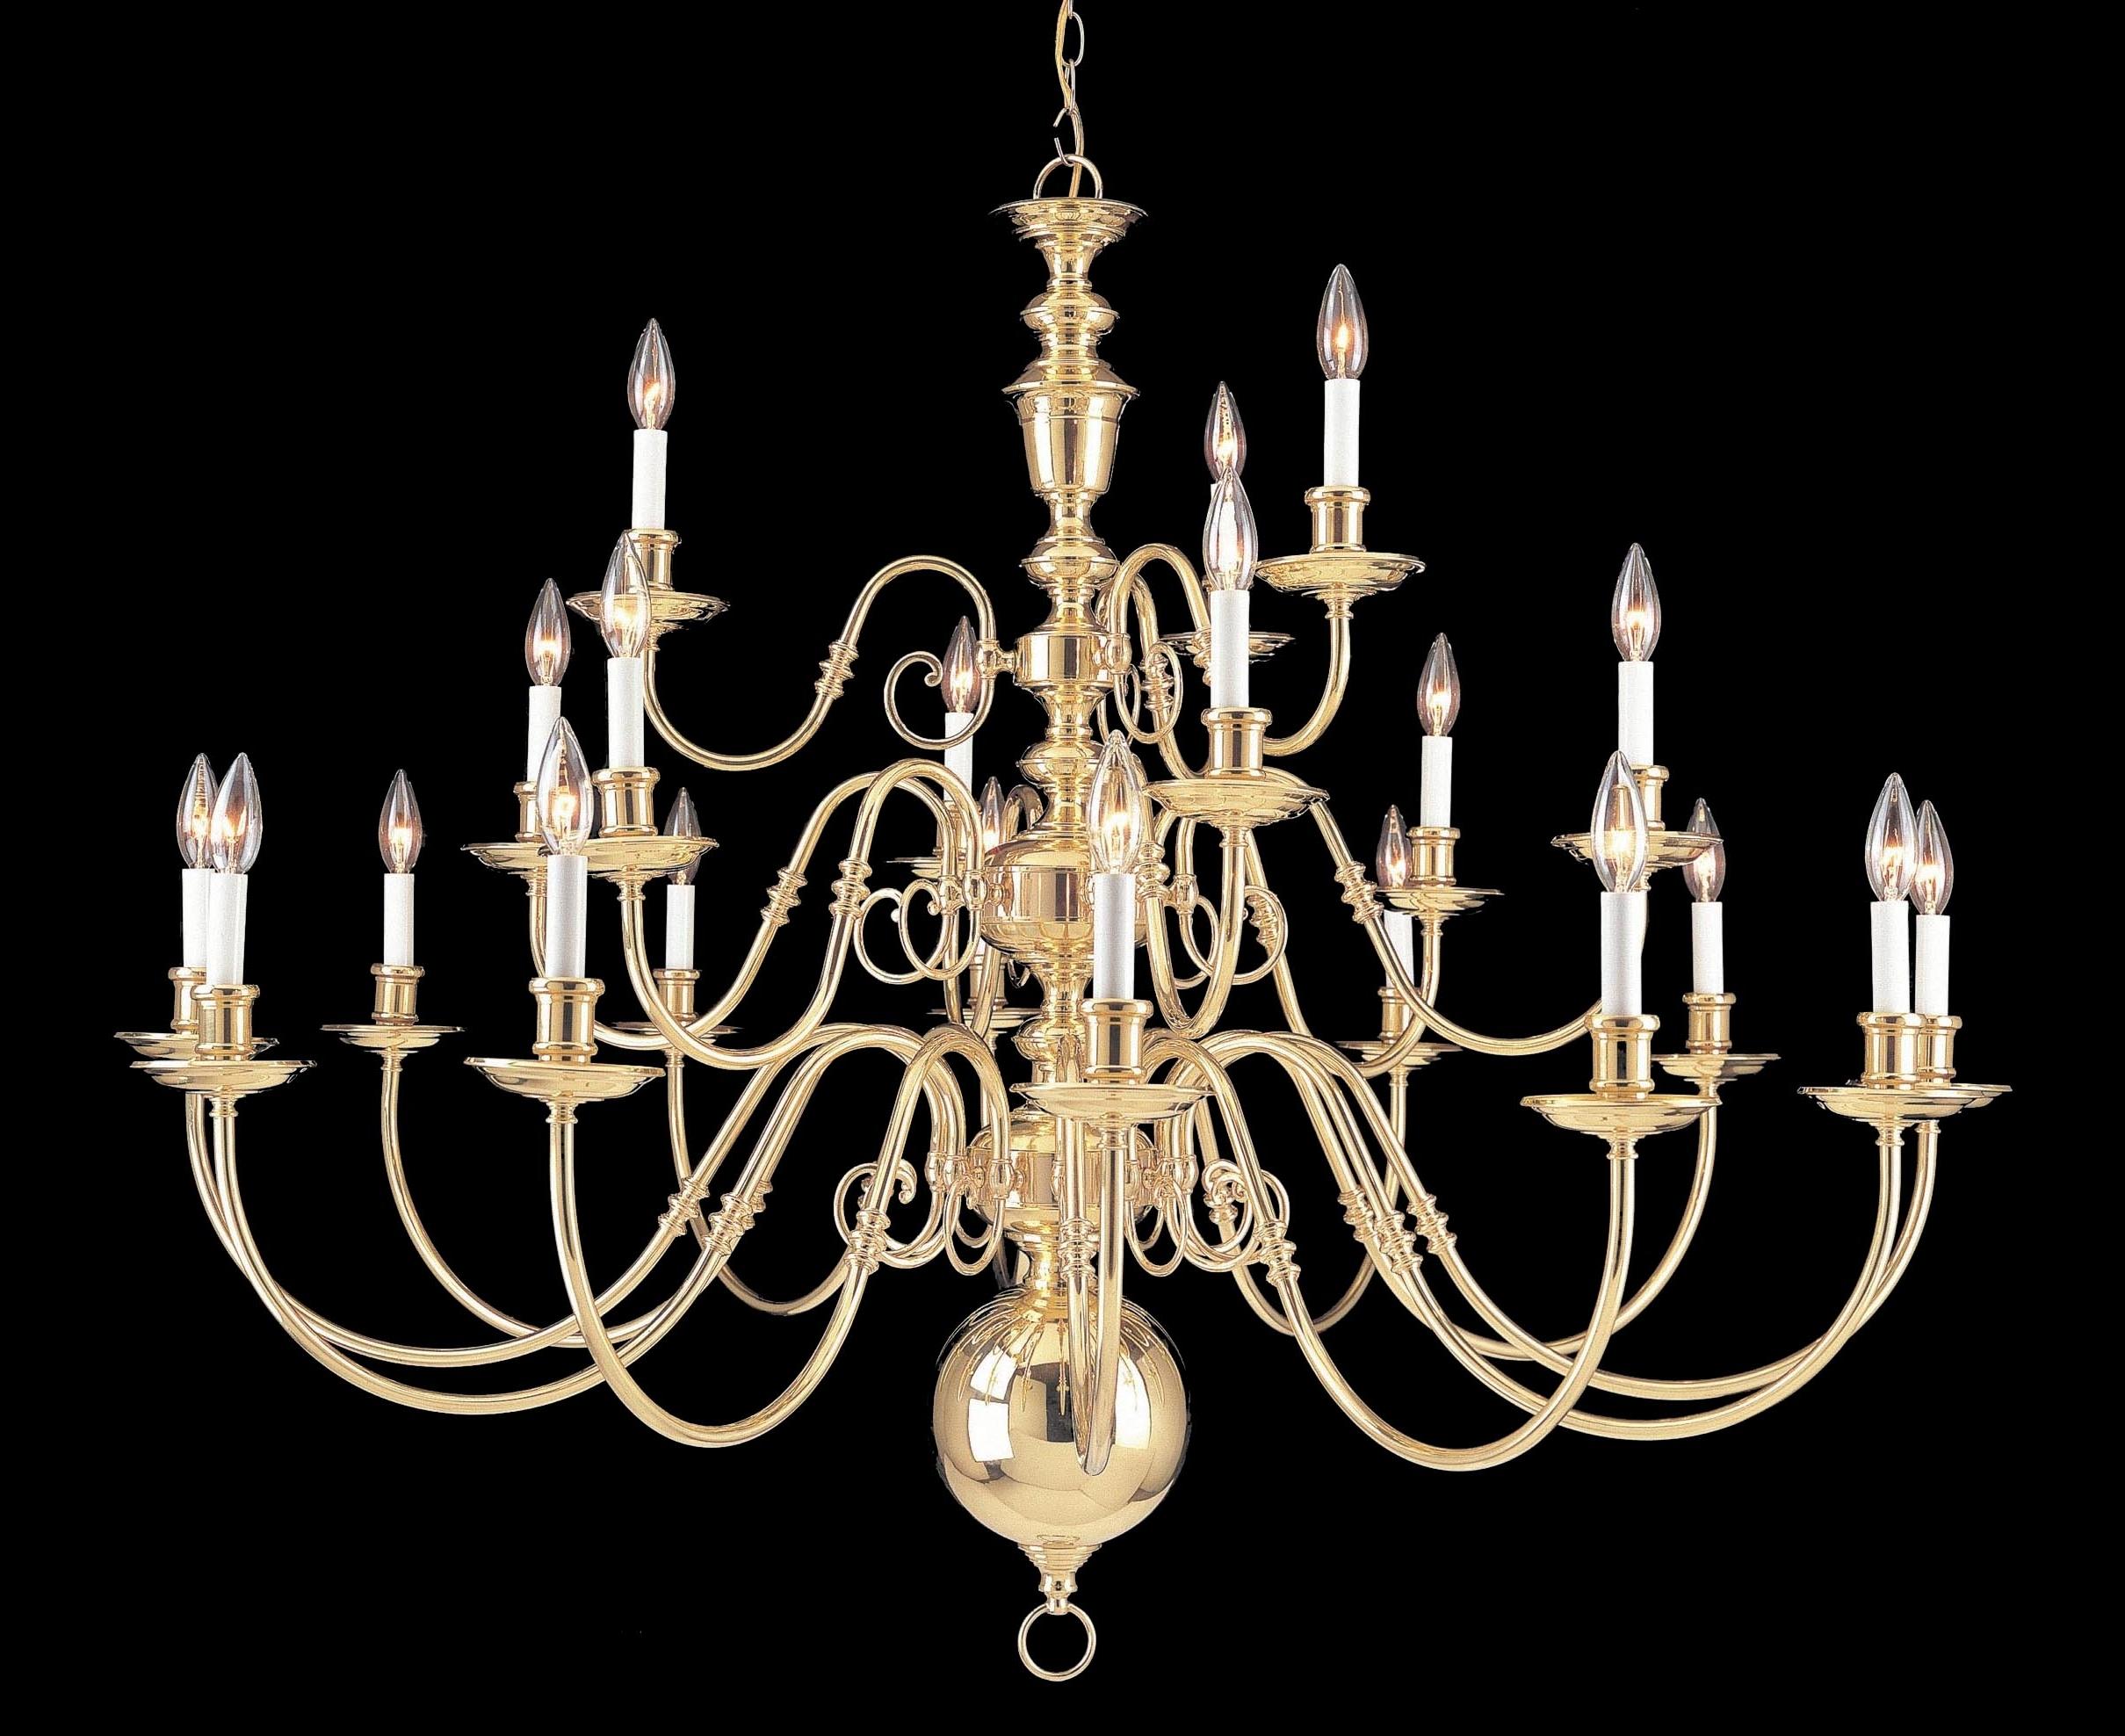 2017 Large Brass Chandelier In Largelighting – Brass/bronze Chandeliers (View 5 of 15)